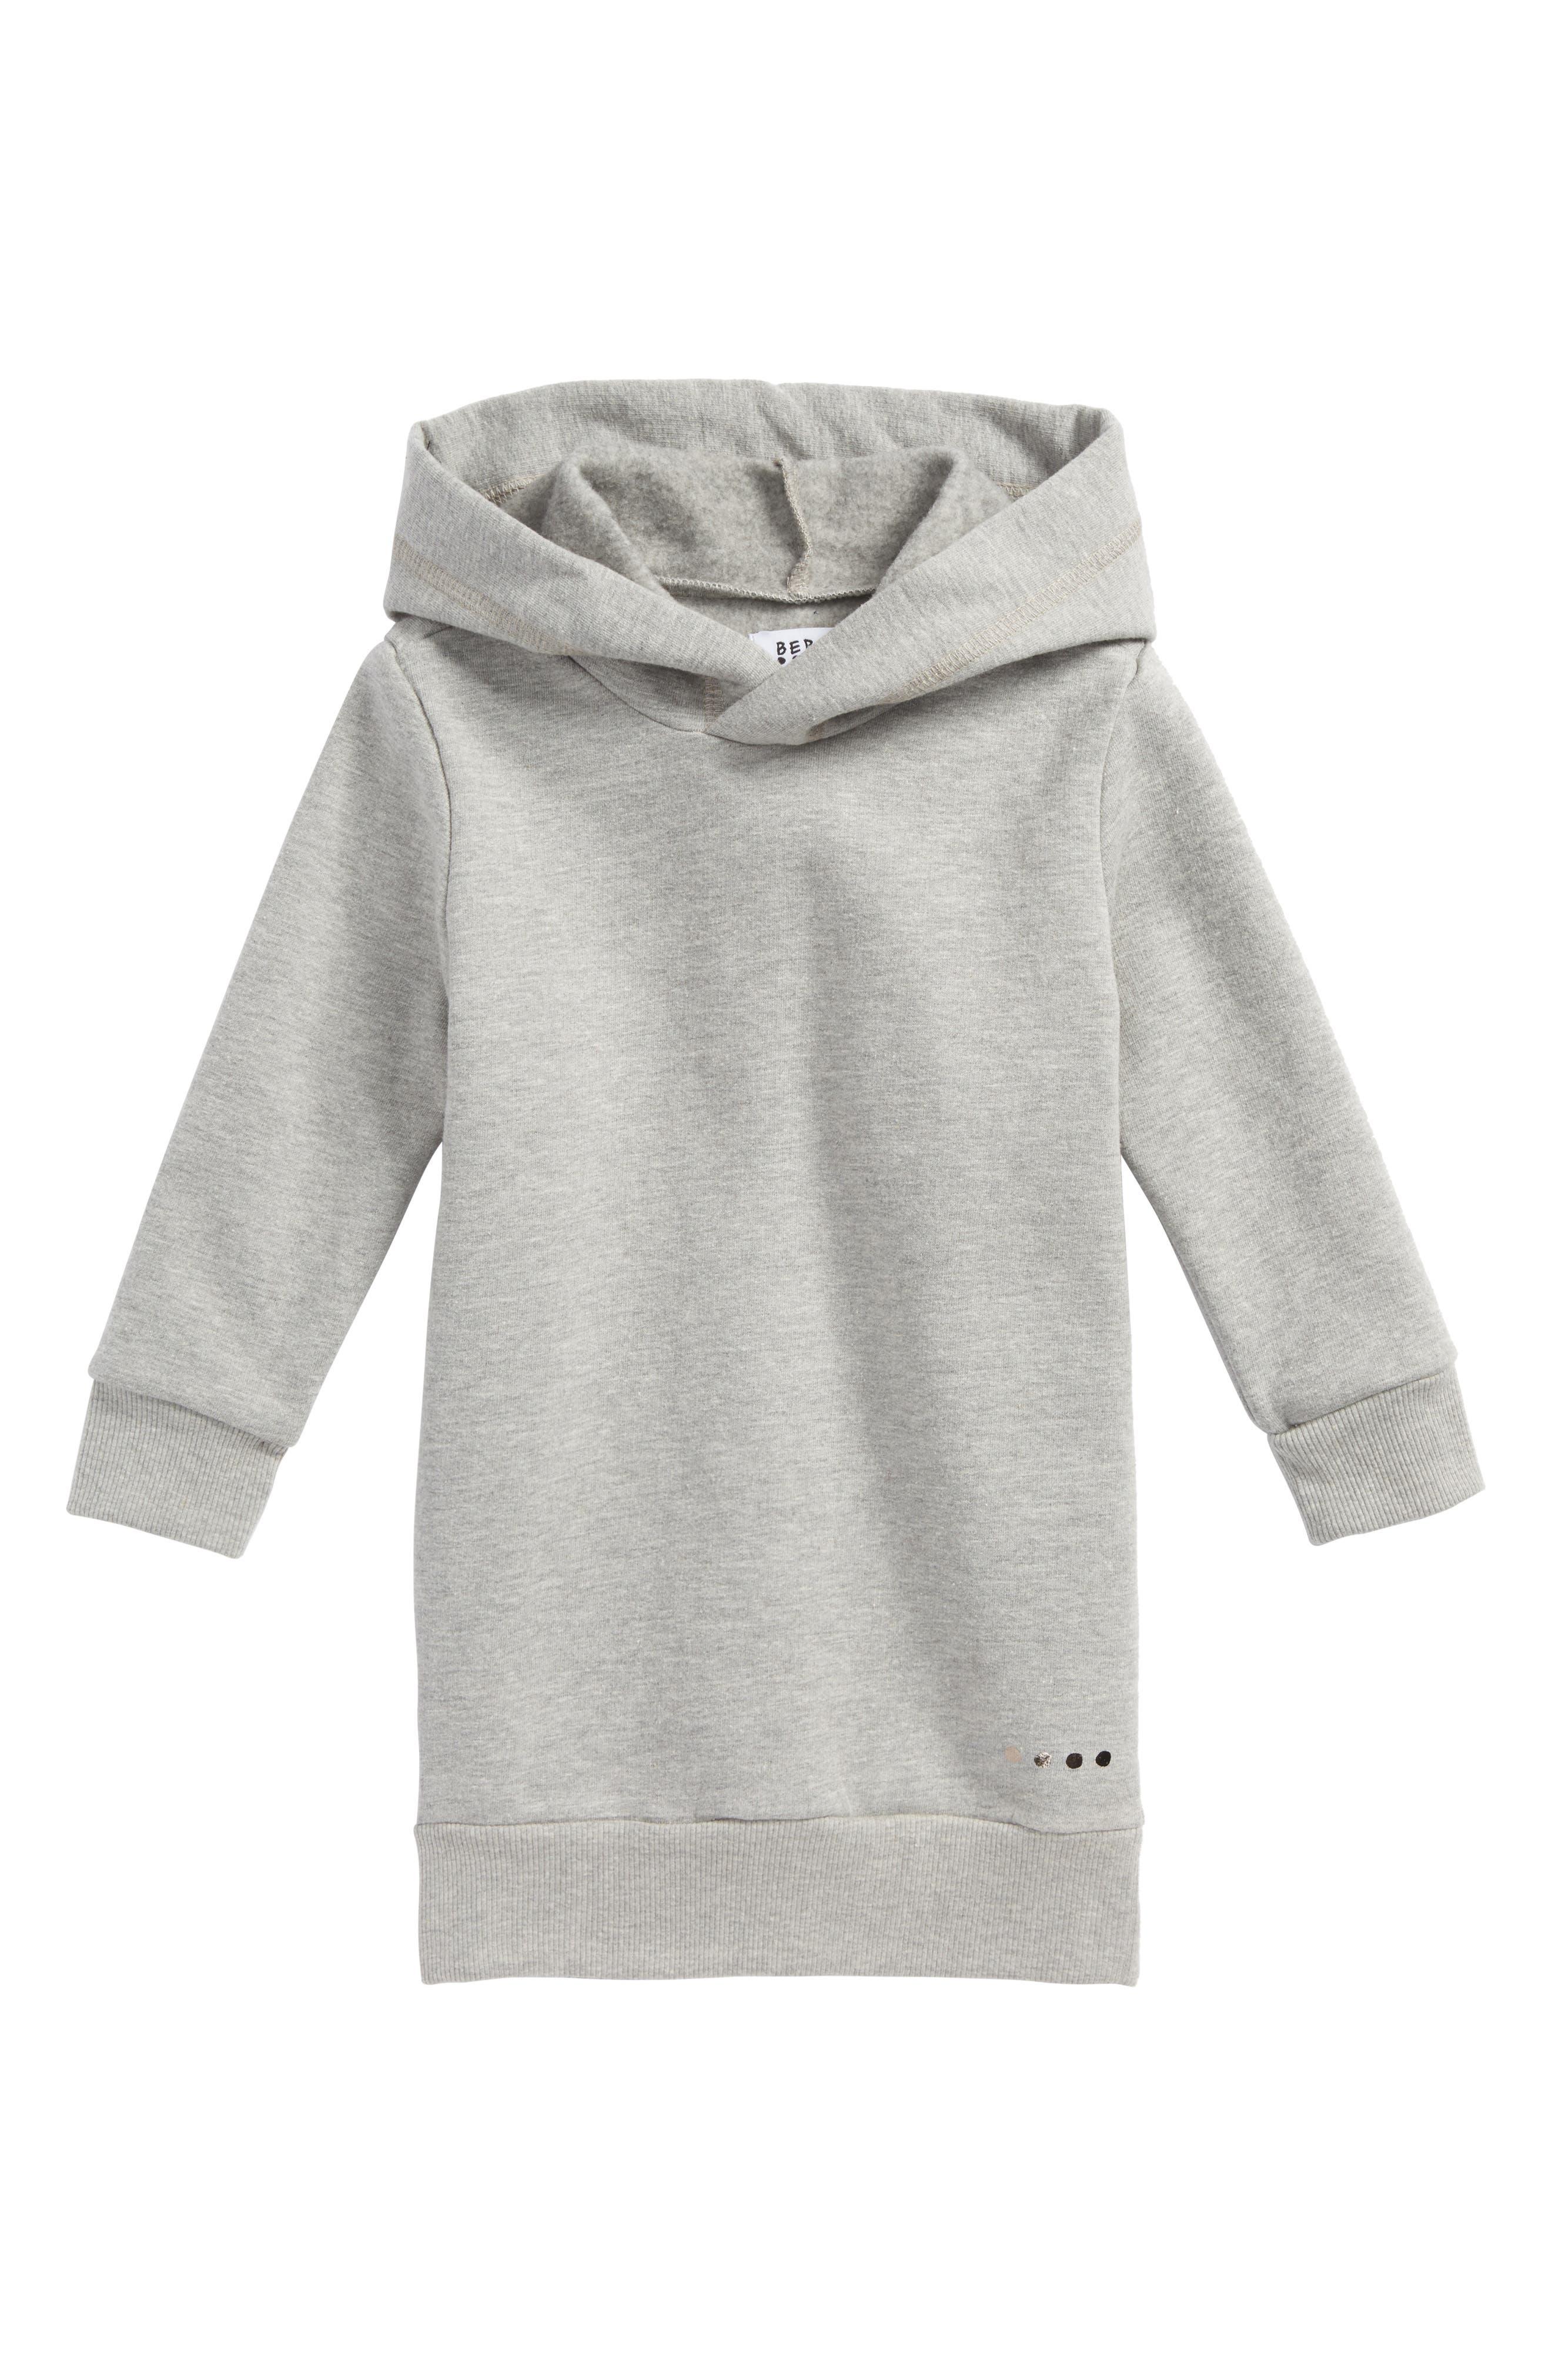 Alternate Image 1 Selected - Beru Luna Hooded Sweatshirt Dress (Toddler Girls & Little Girls)